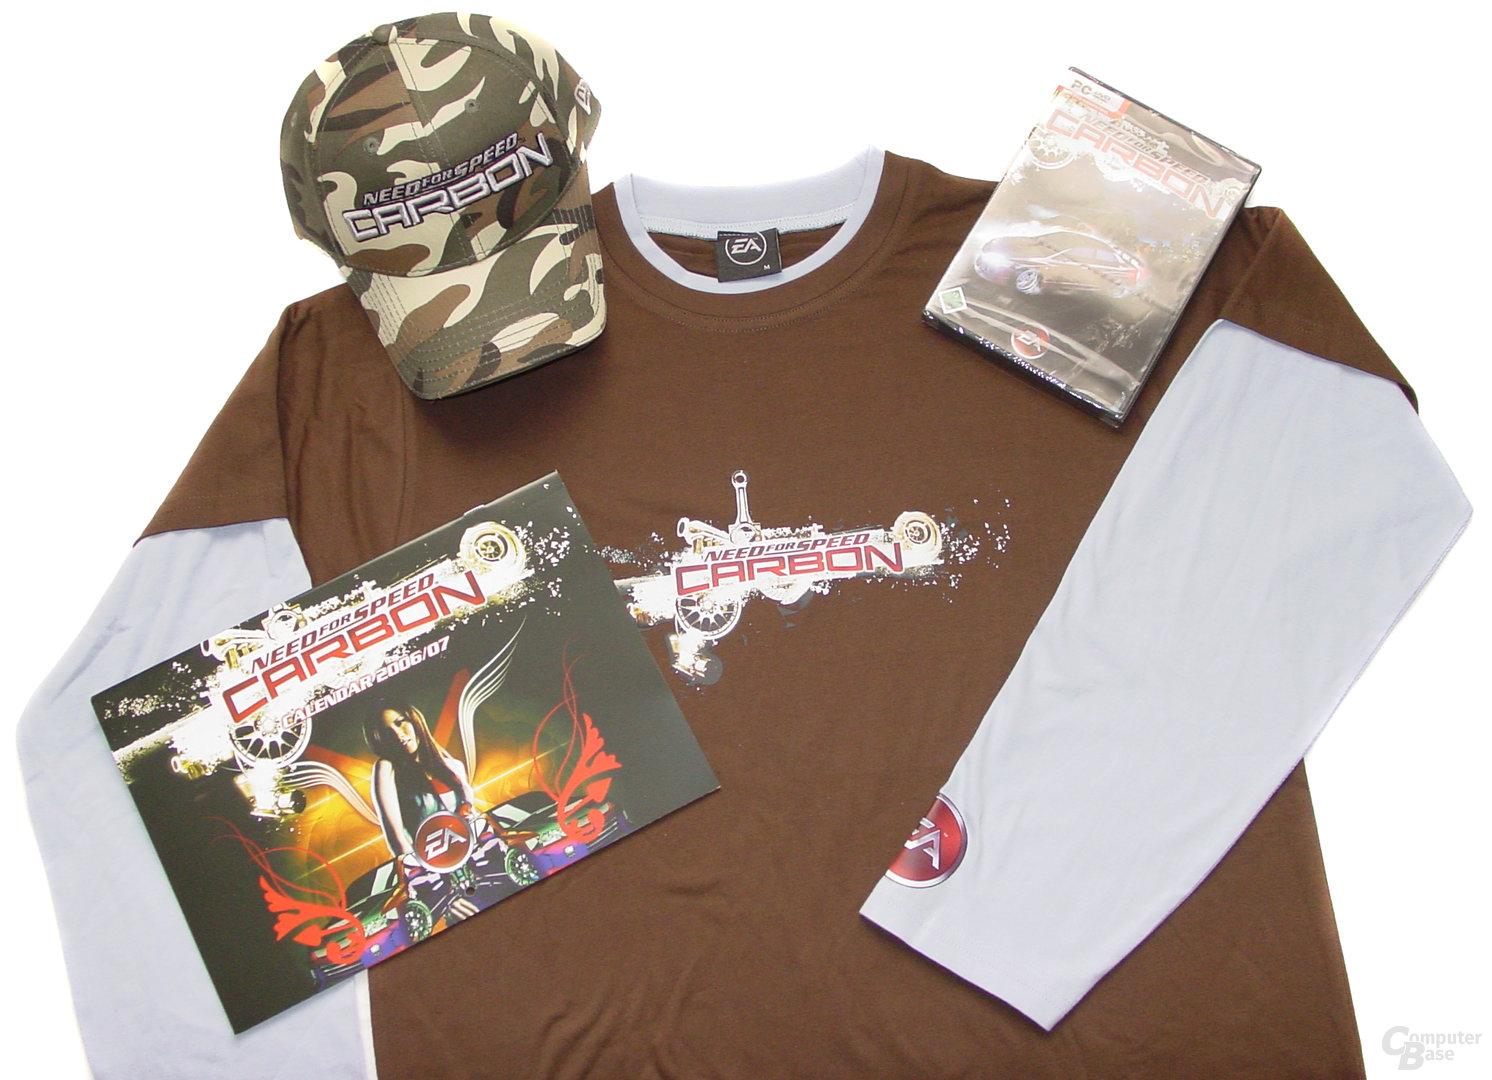 Fanpaket zu Need for Speed Carbon von Electronic Arts